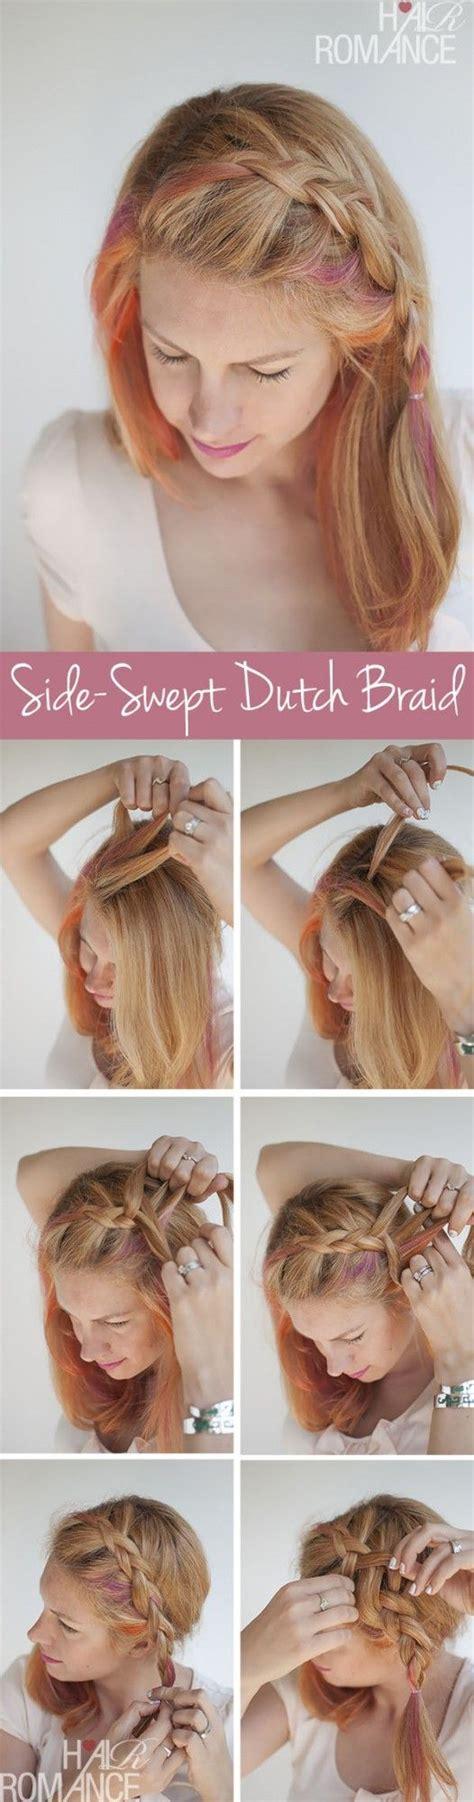 side braid bangs step by step side swept braid hair you won t miss hair tutorials